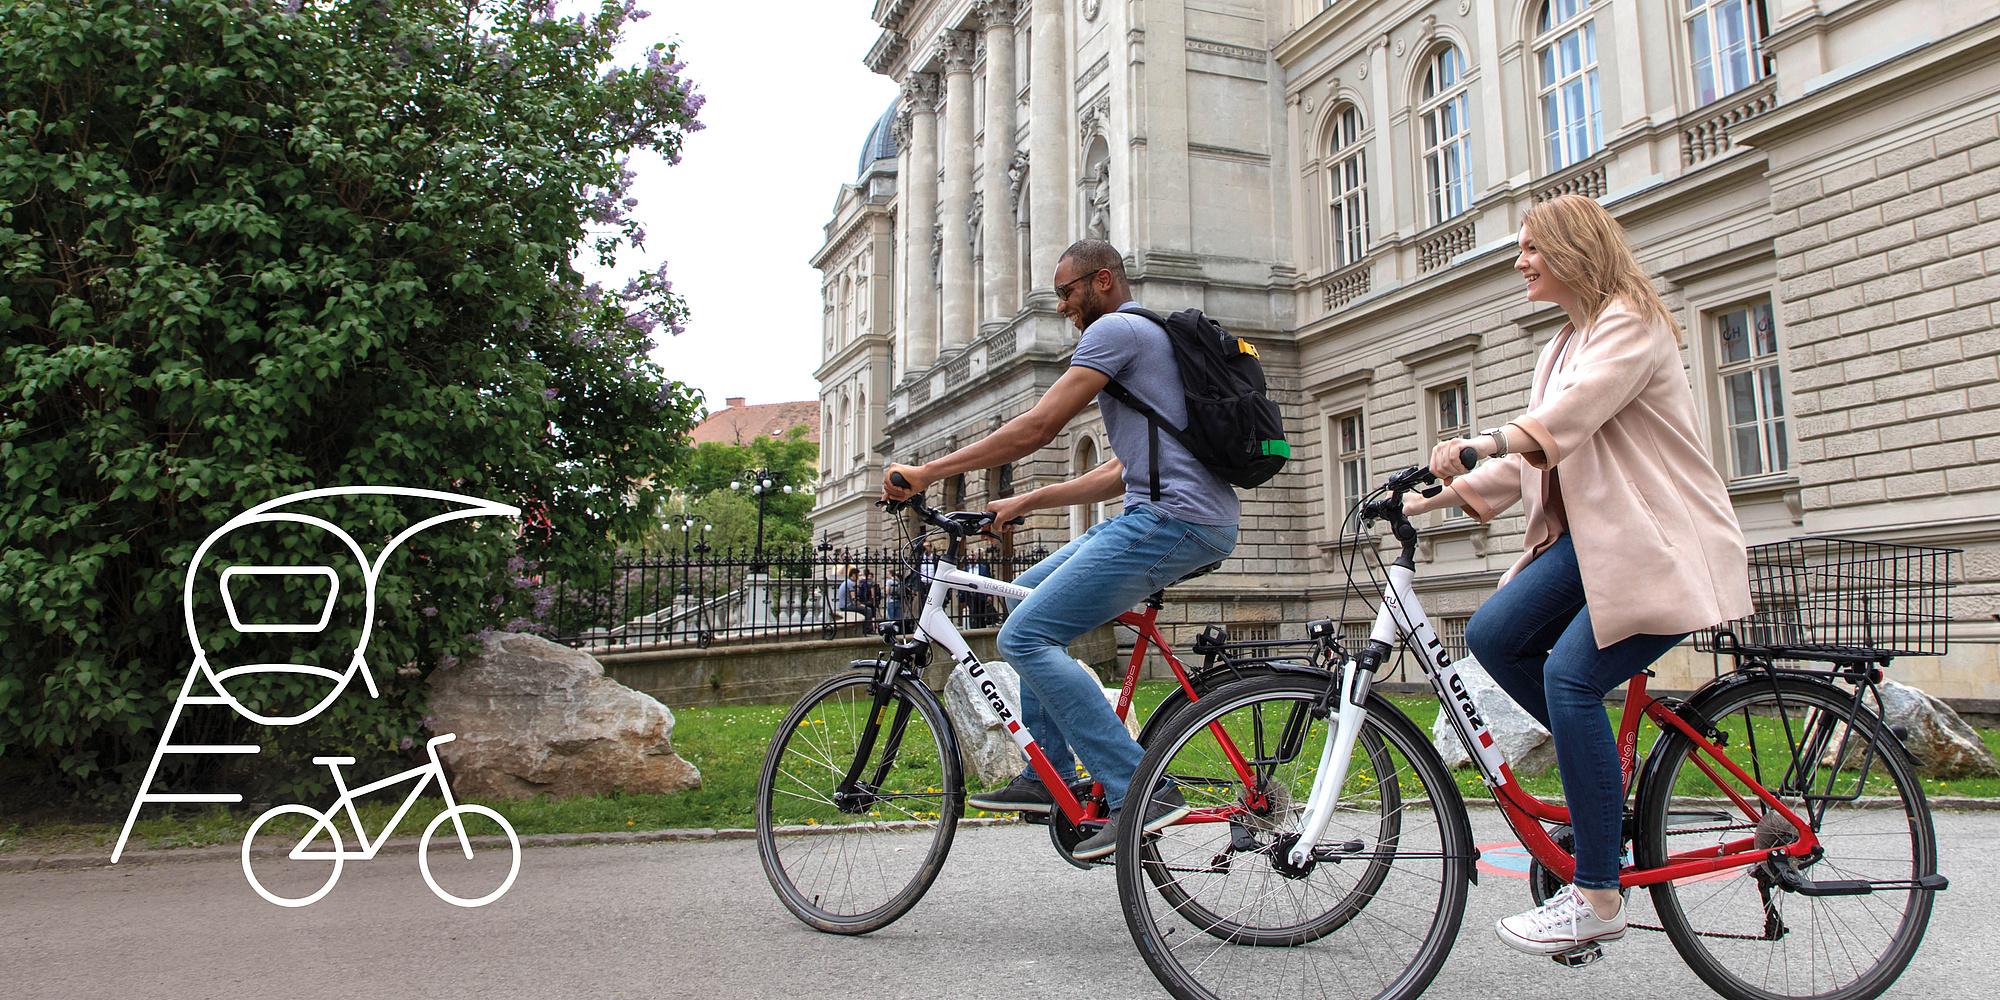 2 people on TU Graz bikes